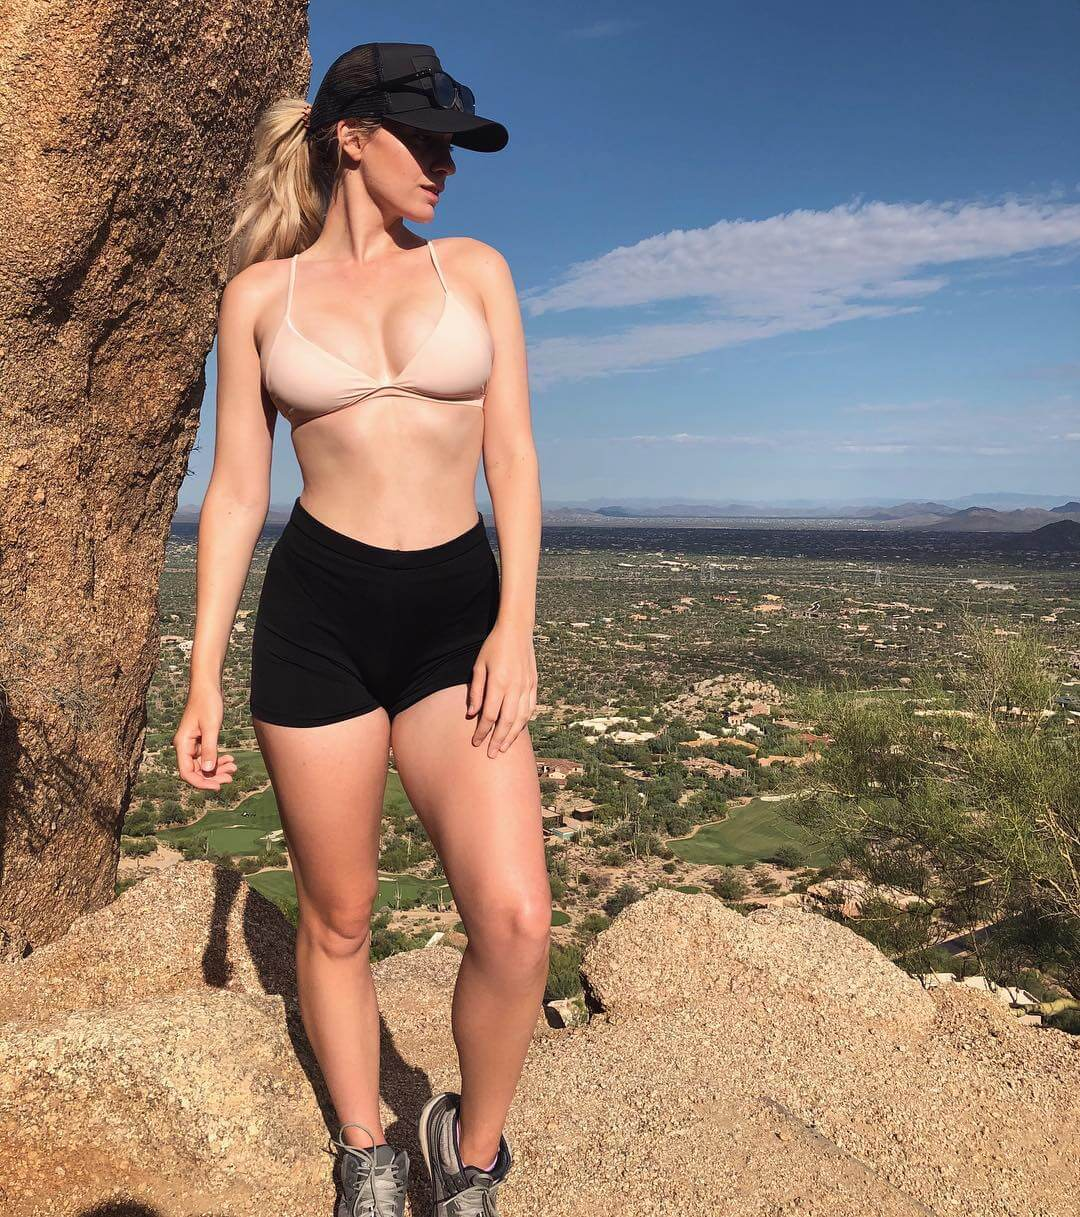 Paige Spiranac hot look